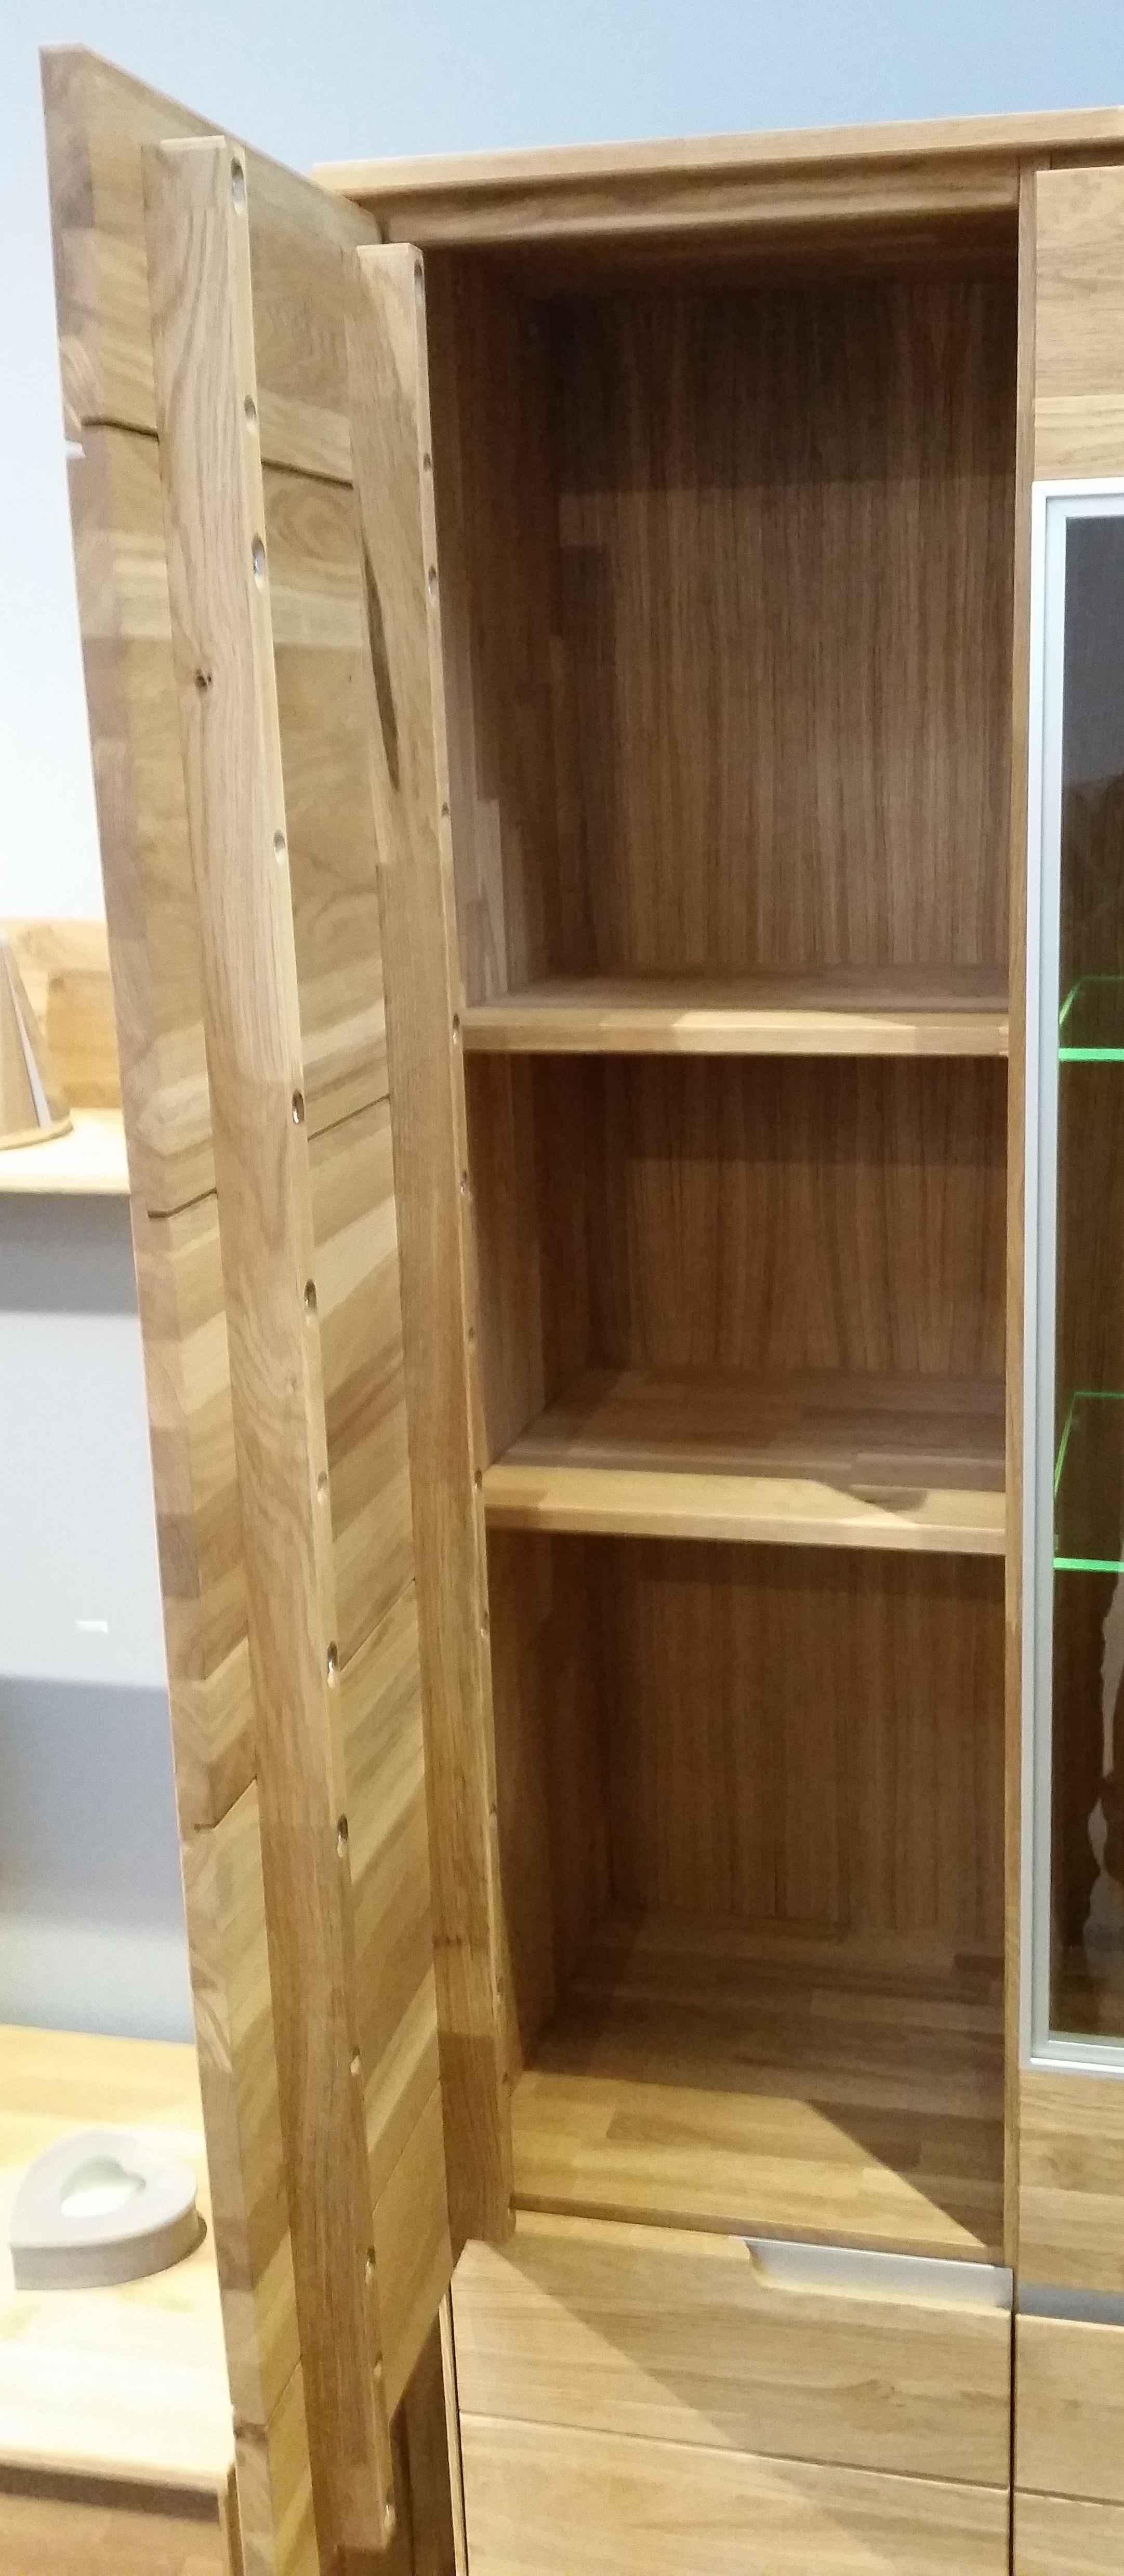 2993 lissy lissabon wildeiche massiv massivholz vitrine xl. Black Bedroom Furniture Sets. Home Design Ideas